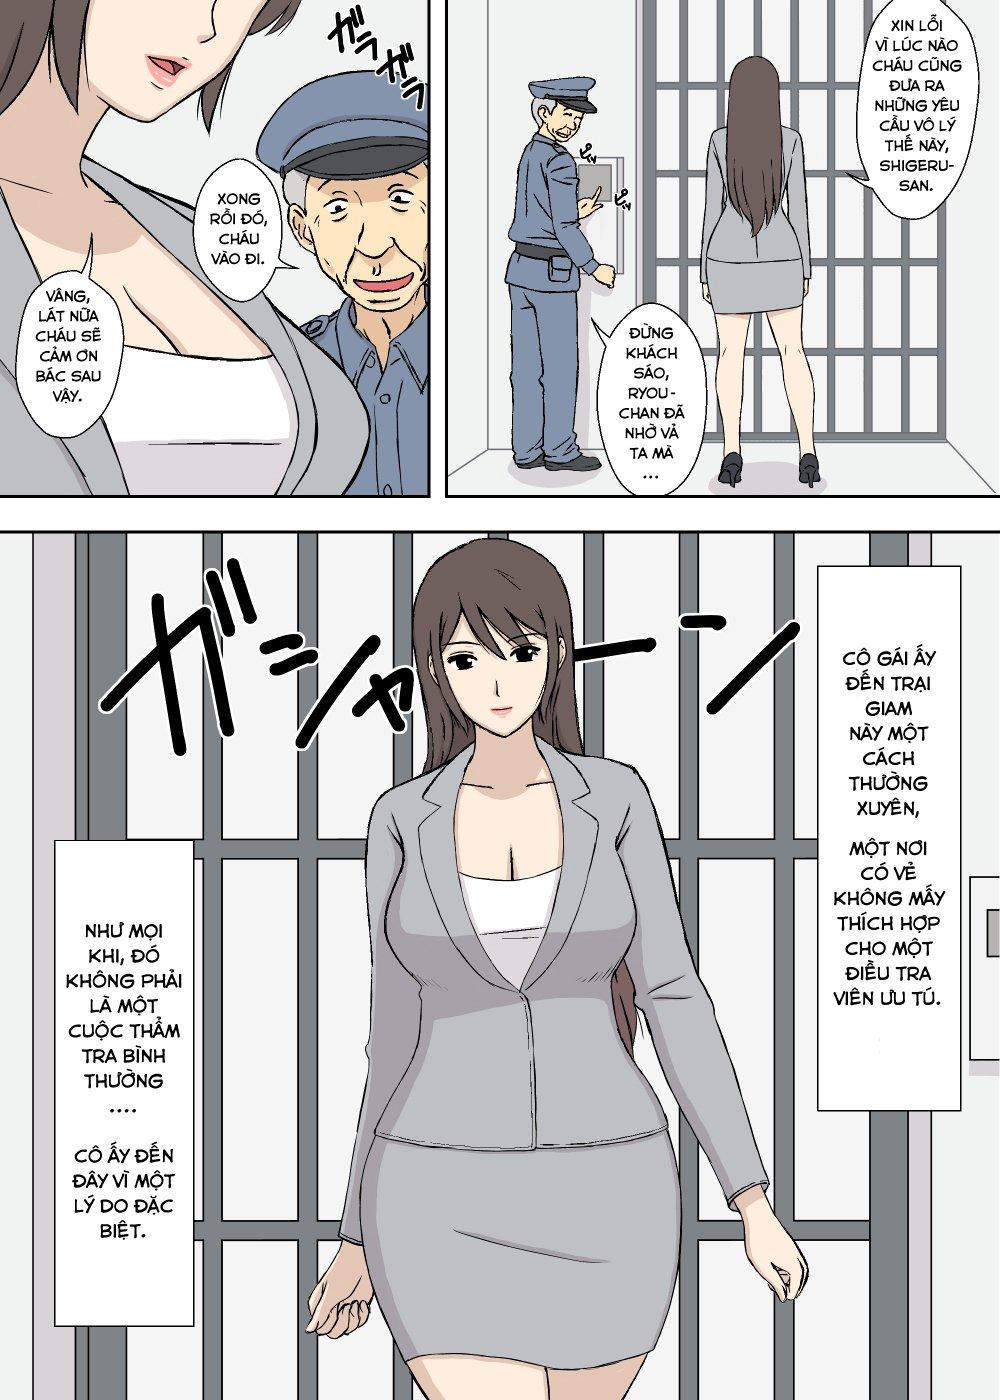 Con Dâu Lăng Loàn - Truyện Hentai